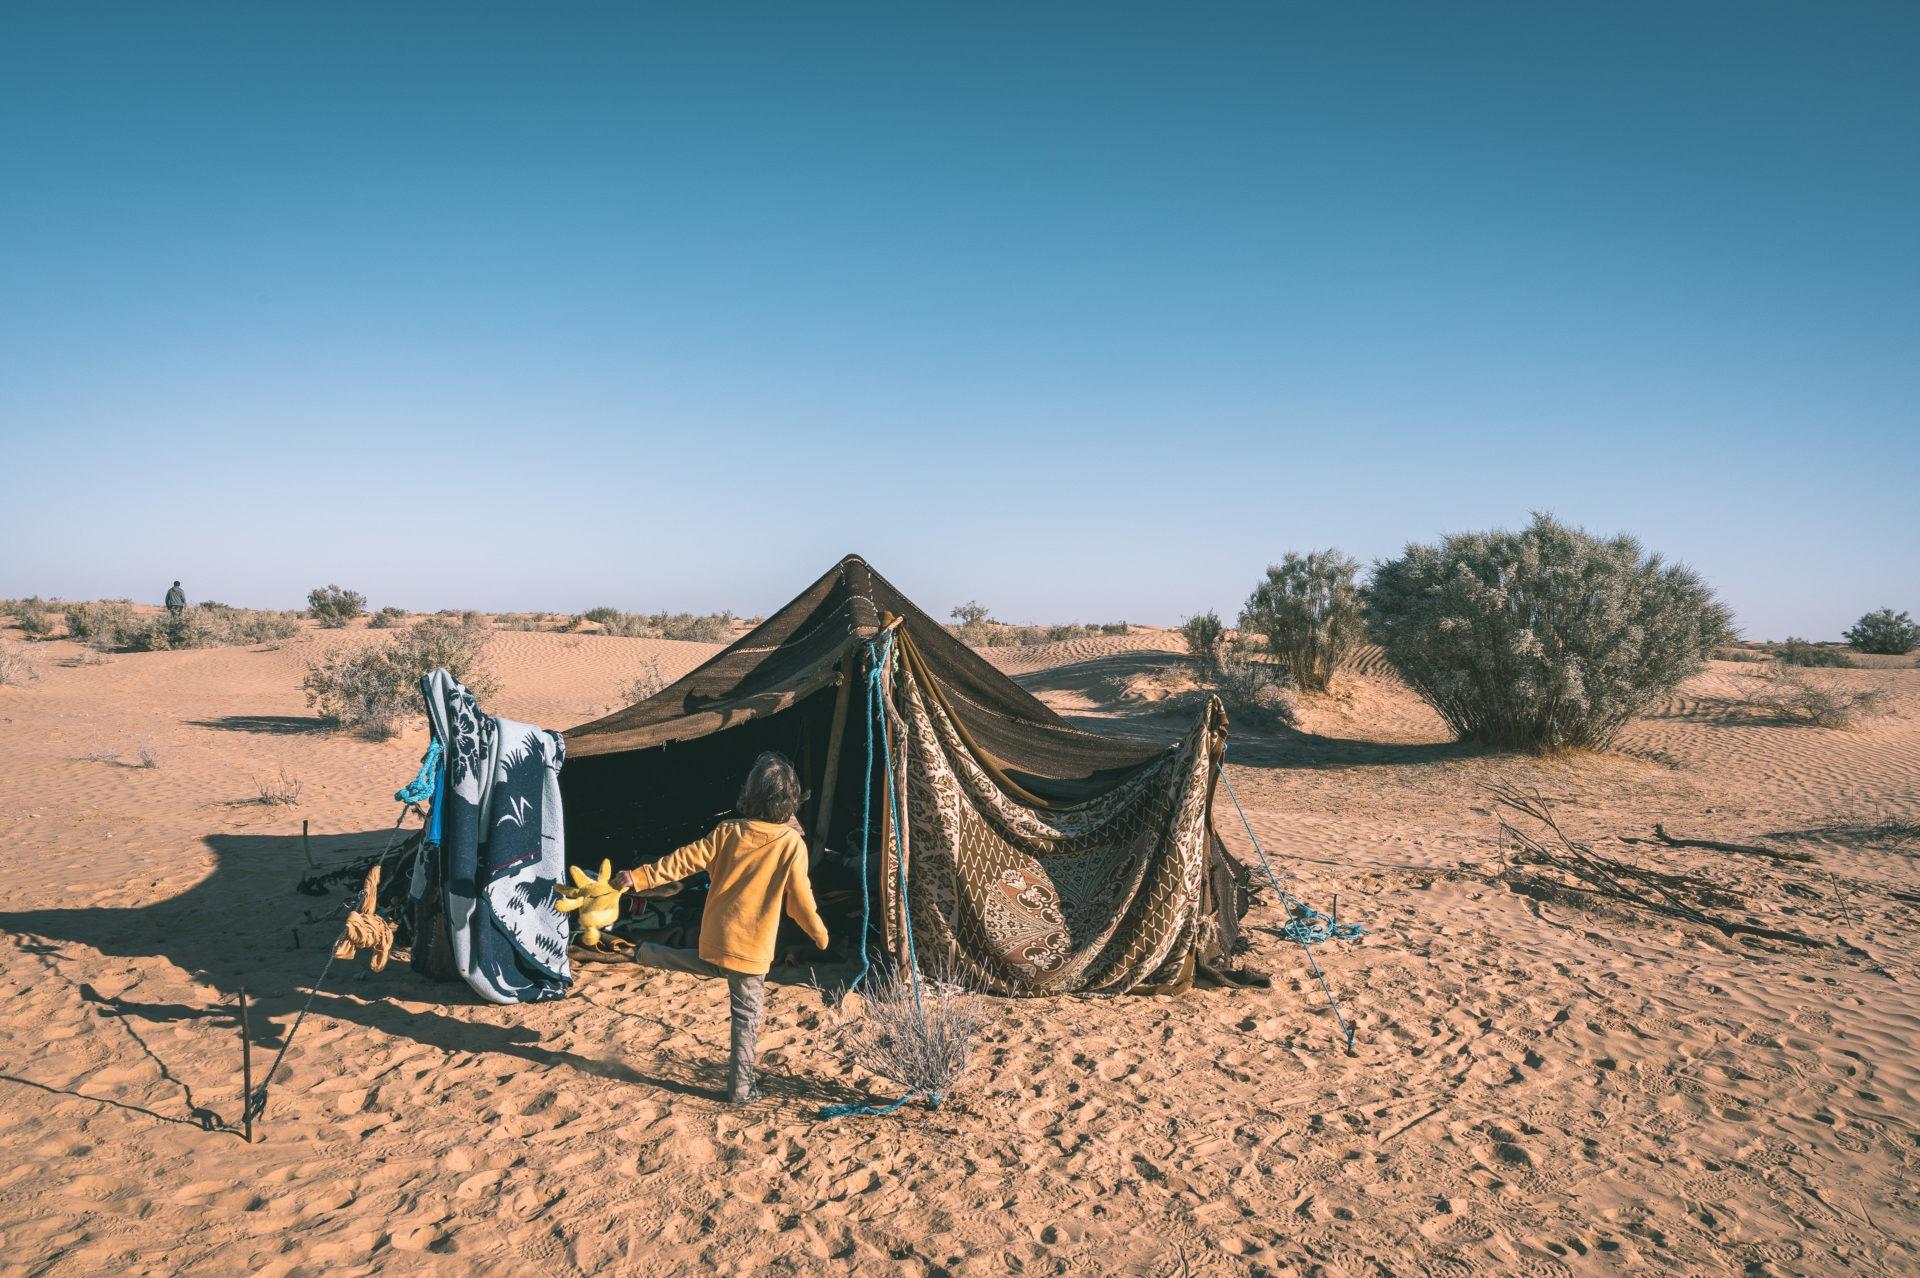 désert tunisien tente